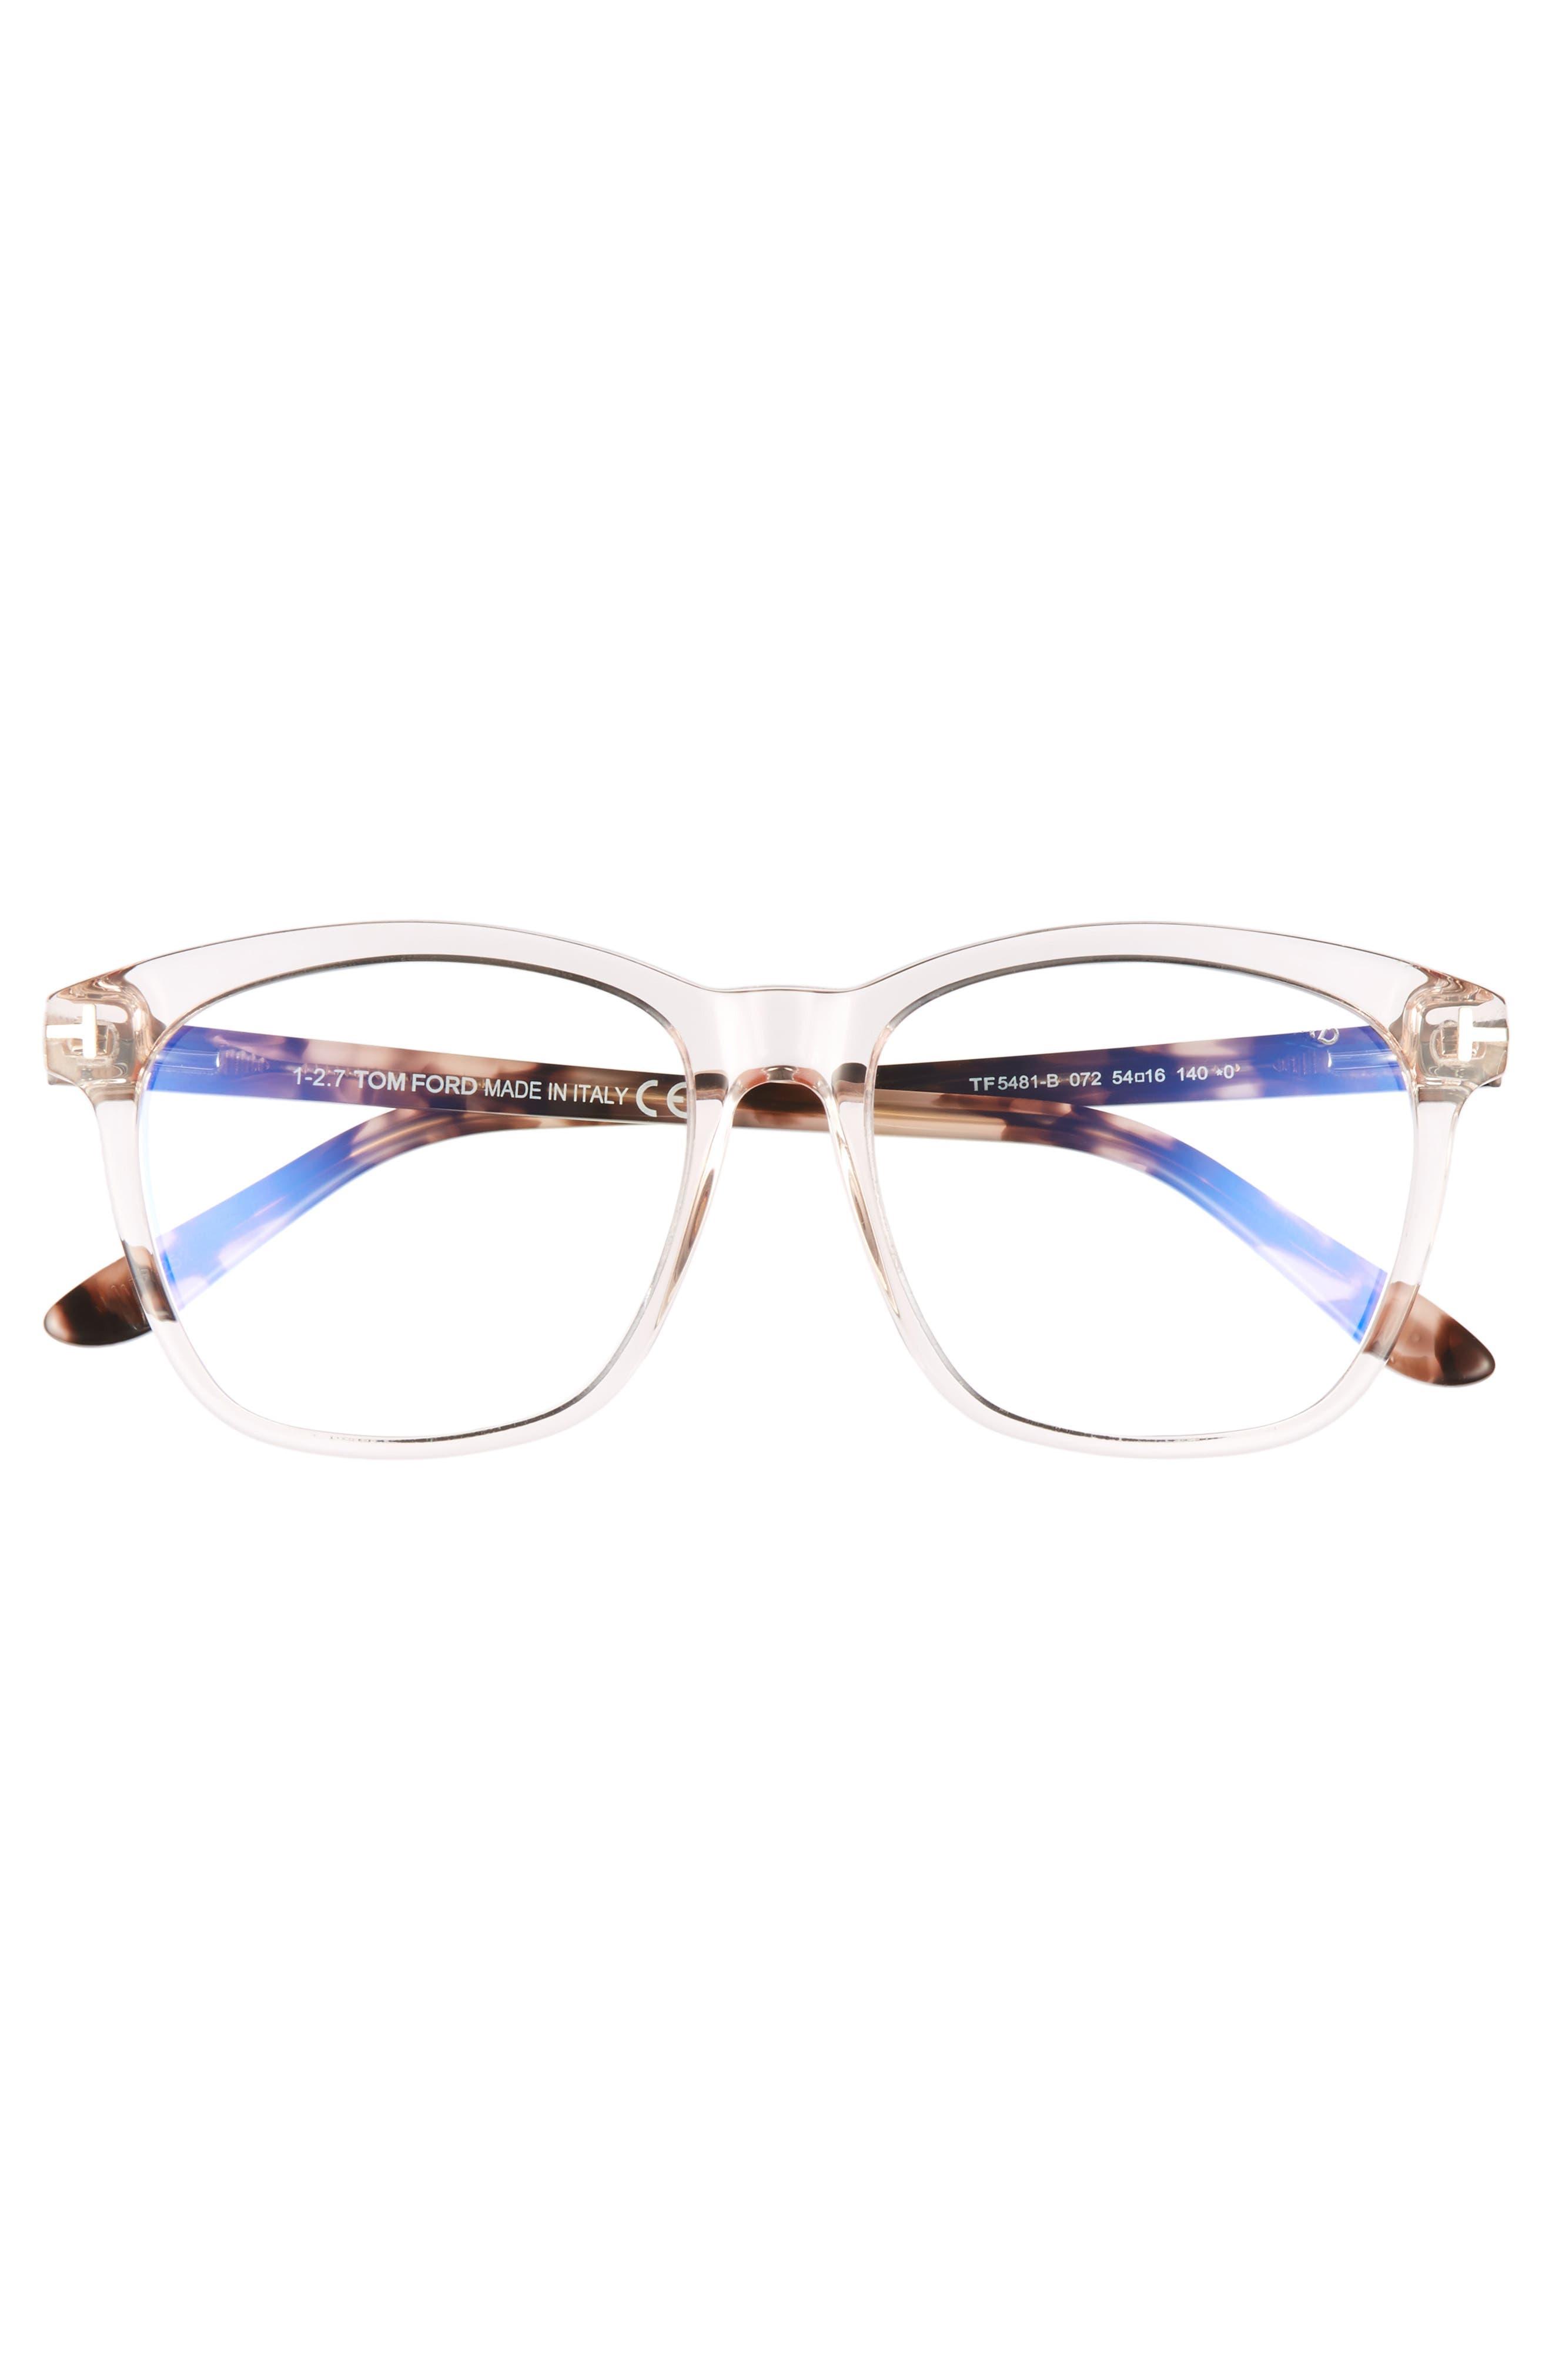 54mm Blue Block Optical Glasses,                             Alternate thumbnail 3, color,                             Shiny Pink/ Vintage Havana